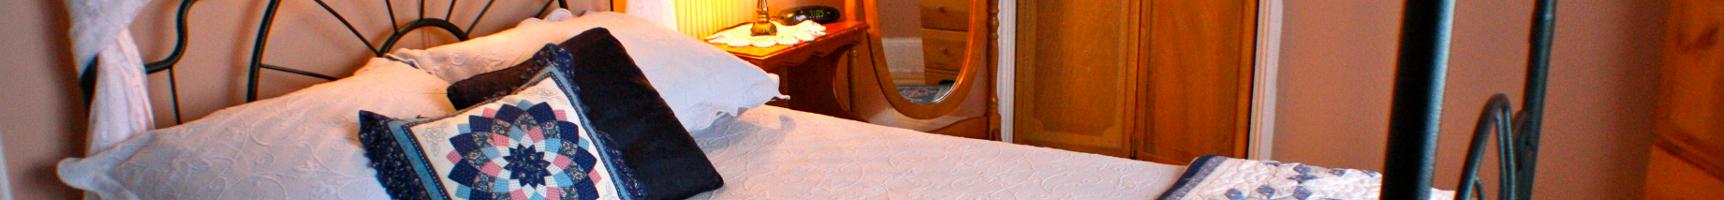 bed breakfast inn accommodations in trinity newfoundland my